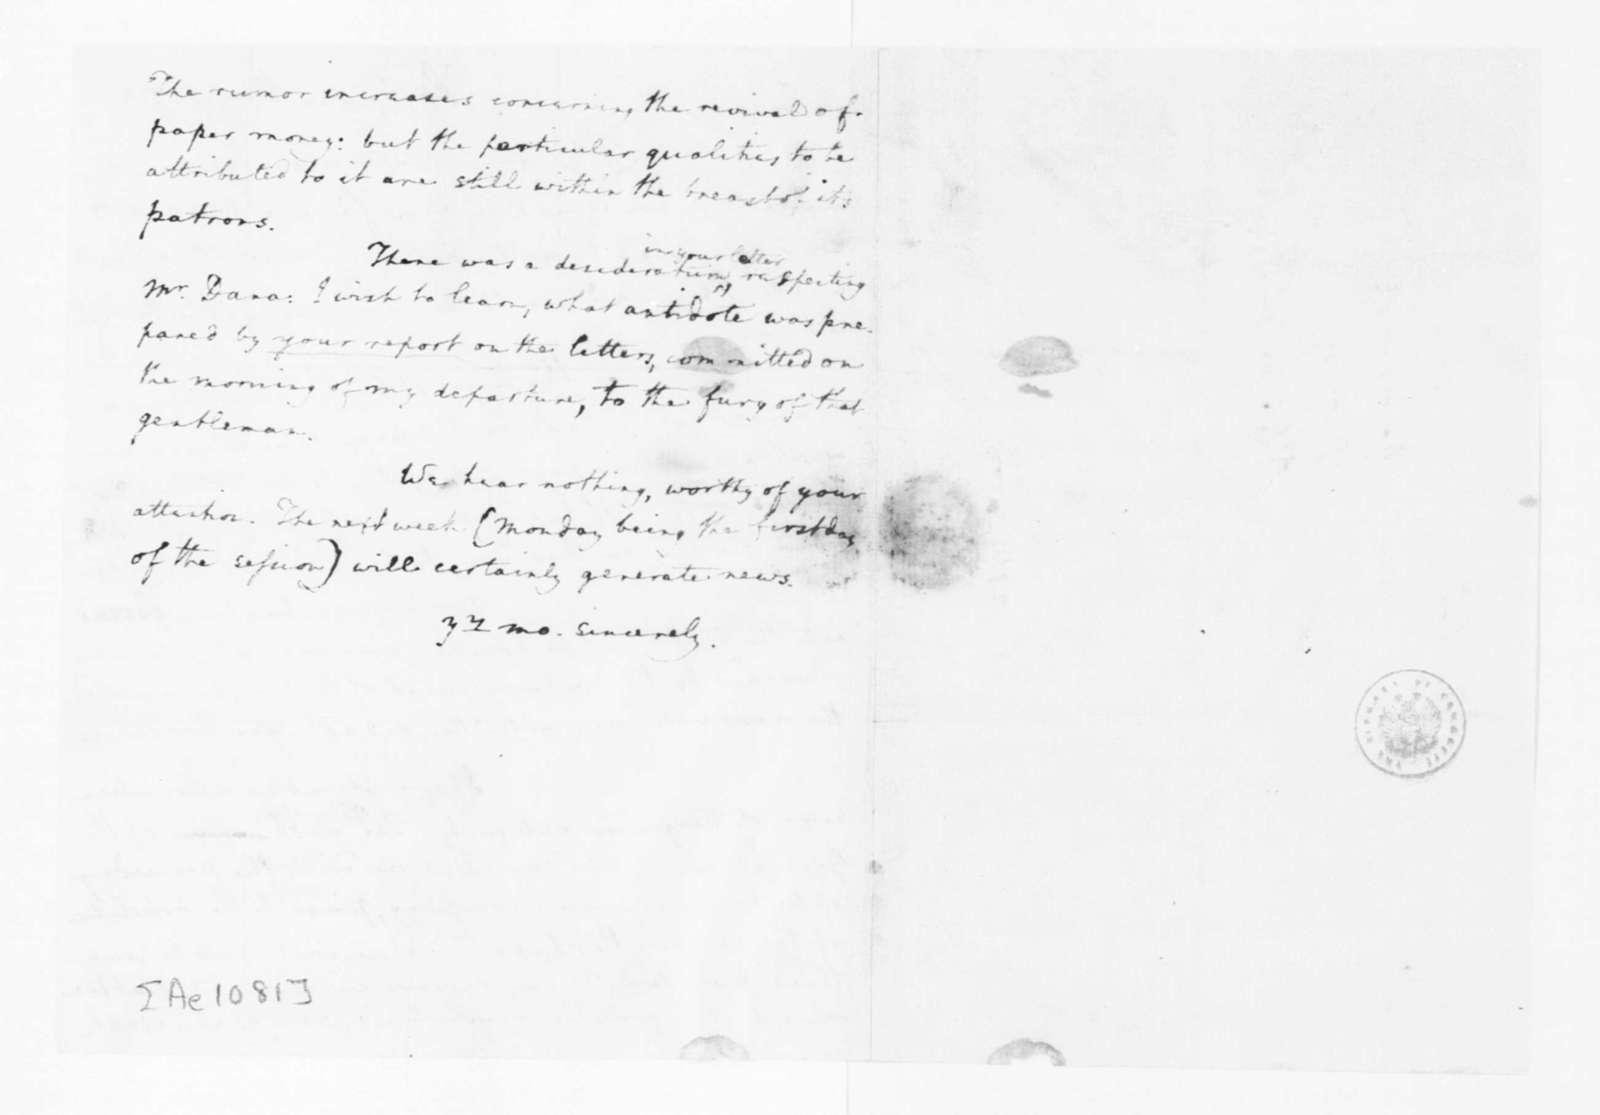 Edmund Randolph to James Madison, May 5, 1782.